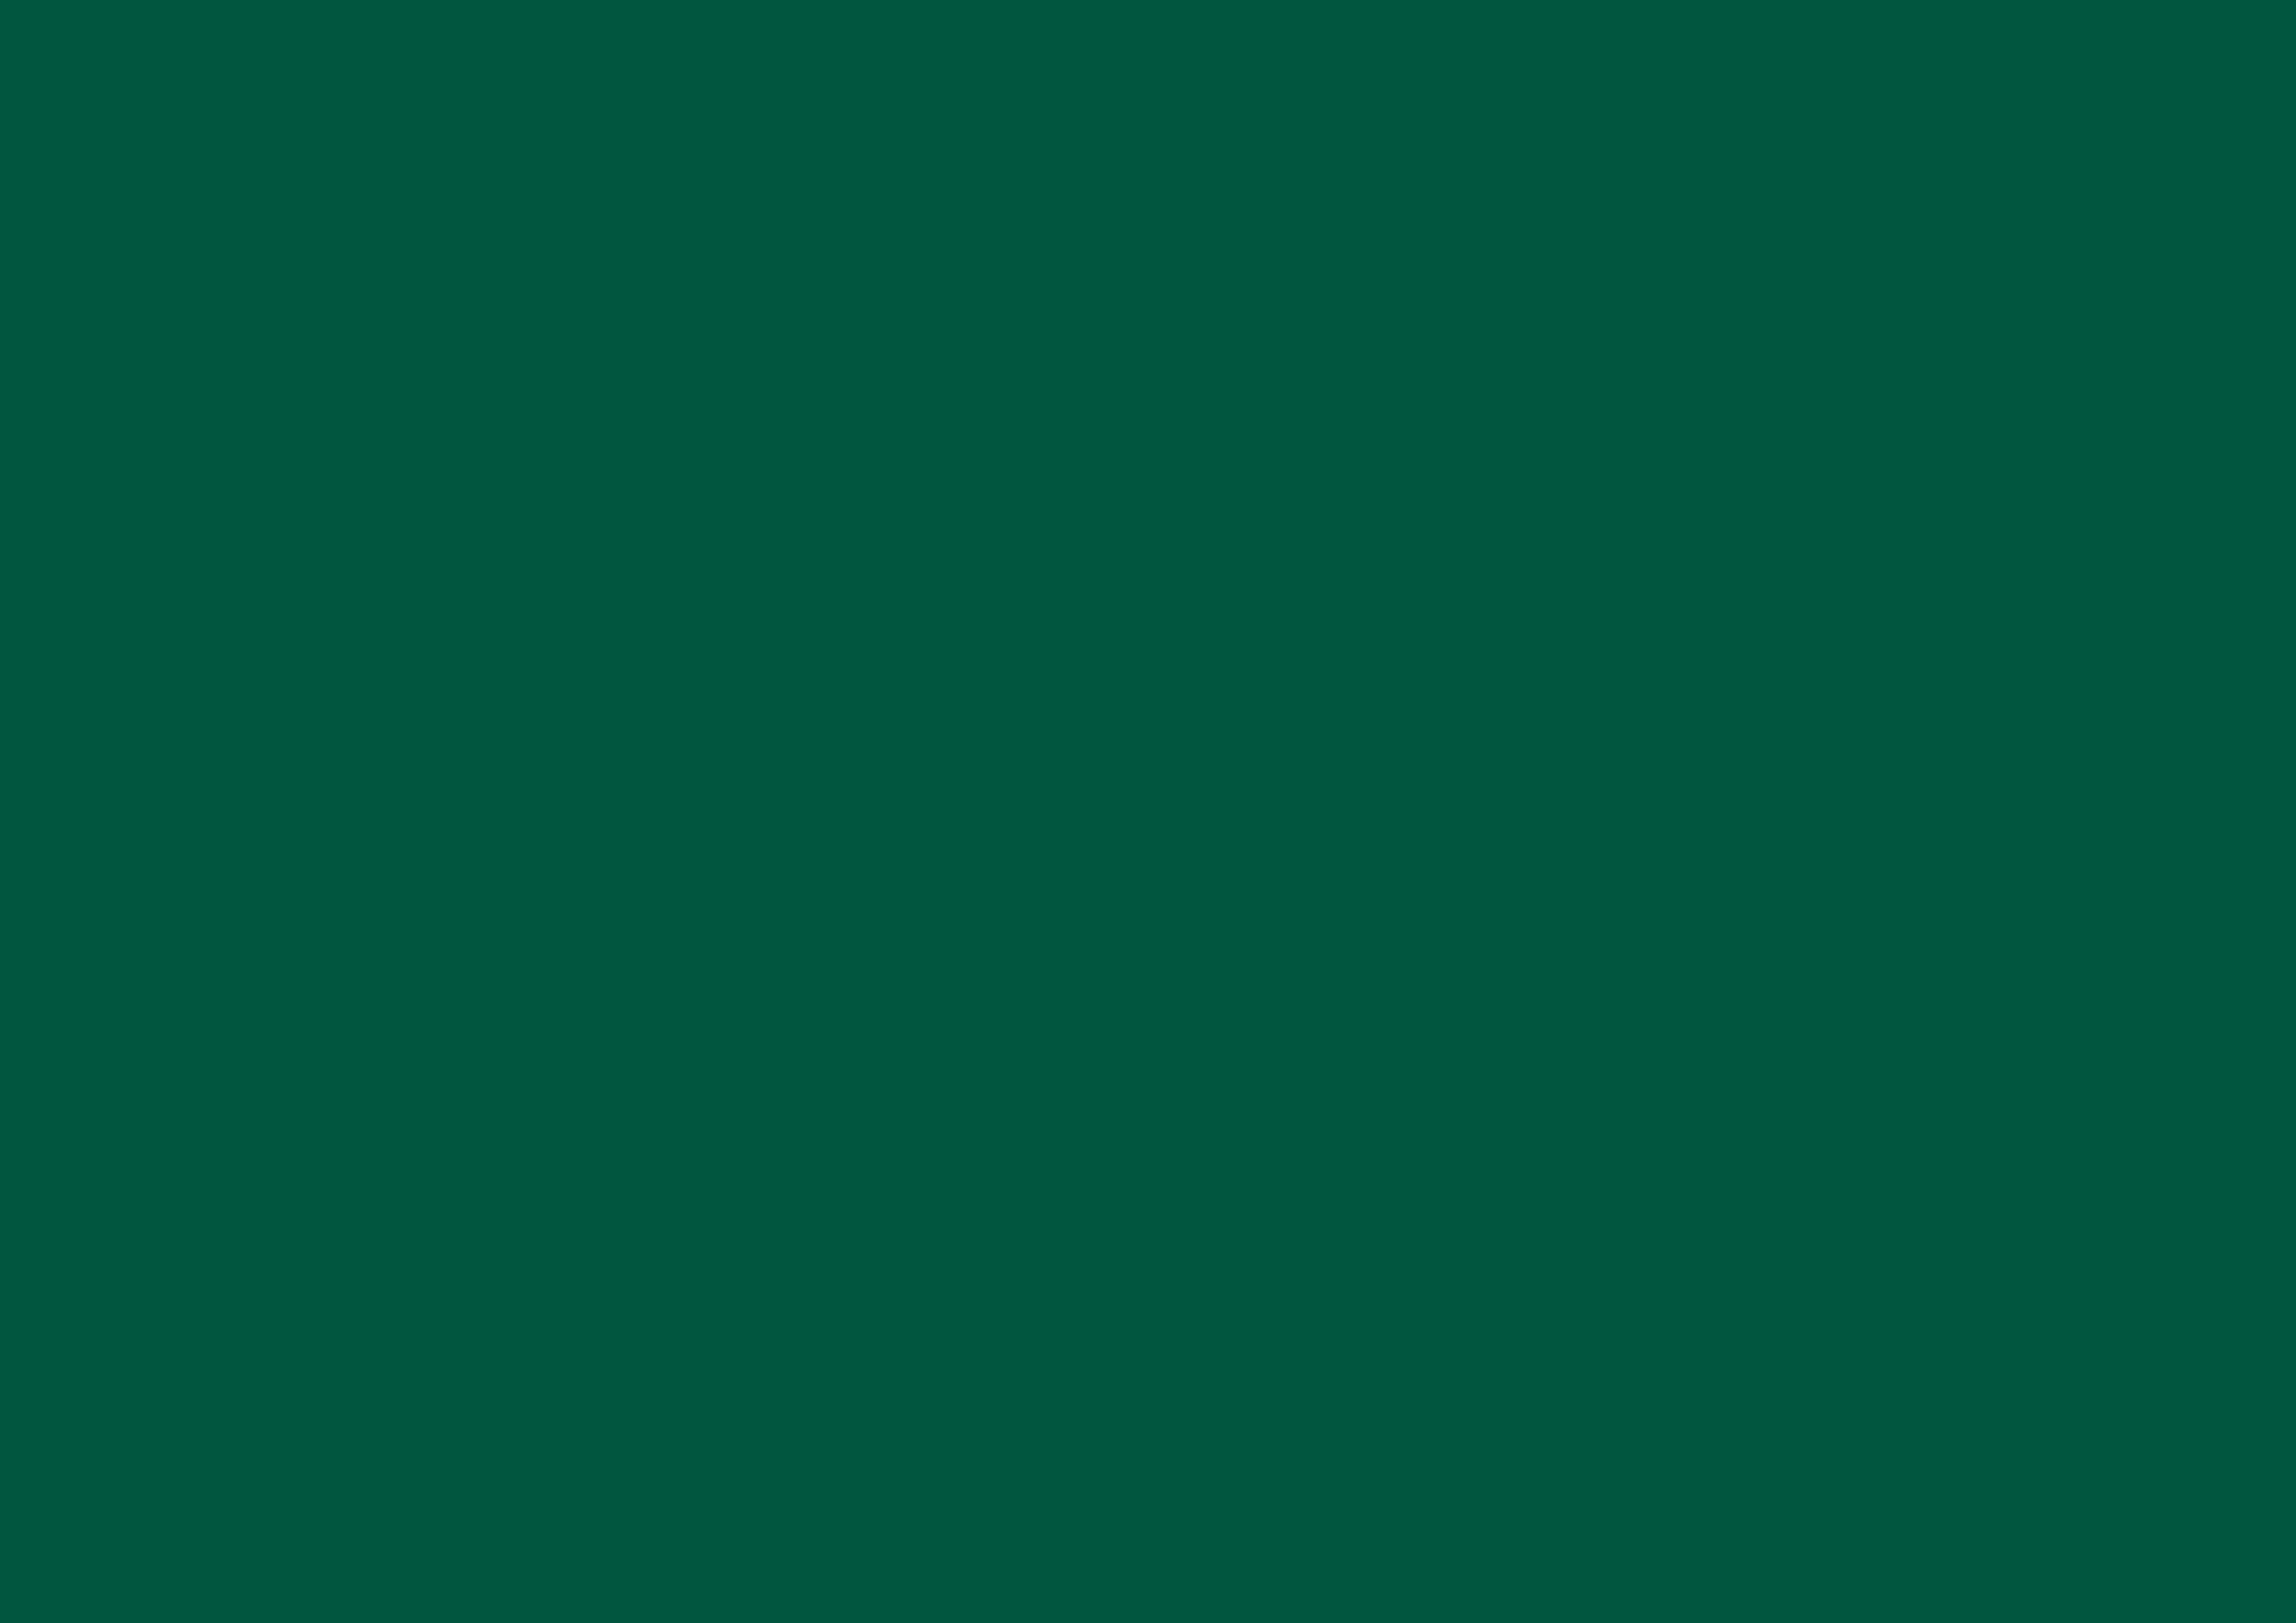 3508x2480 Castleton Green Solid Color Background